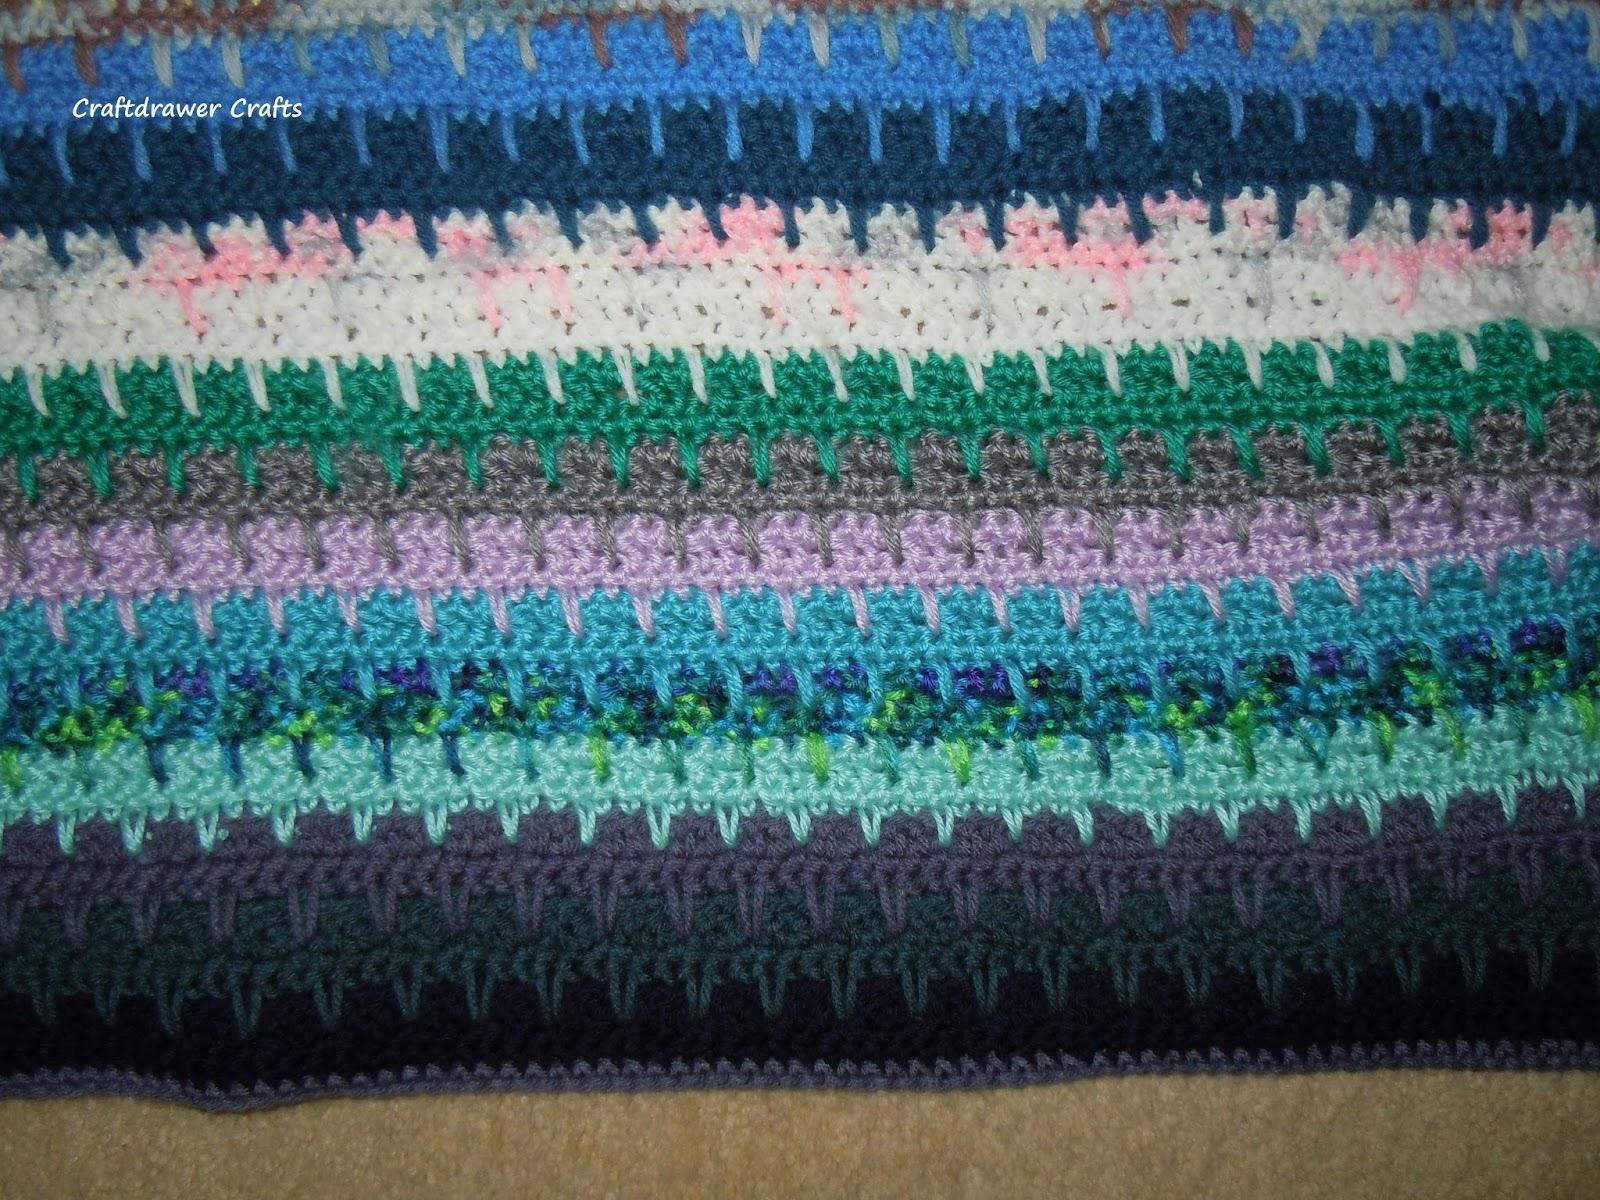 Free Crochet Pattern Easy to Crochet V-Stitch Scrap Yarn Afghan